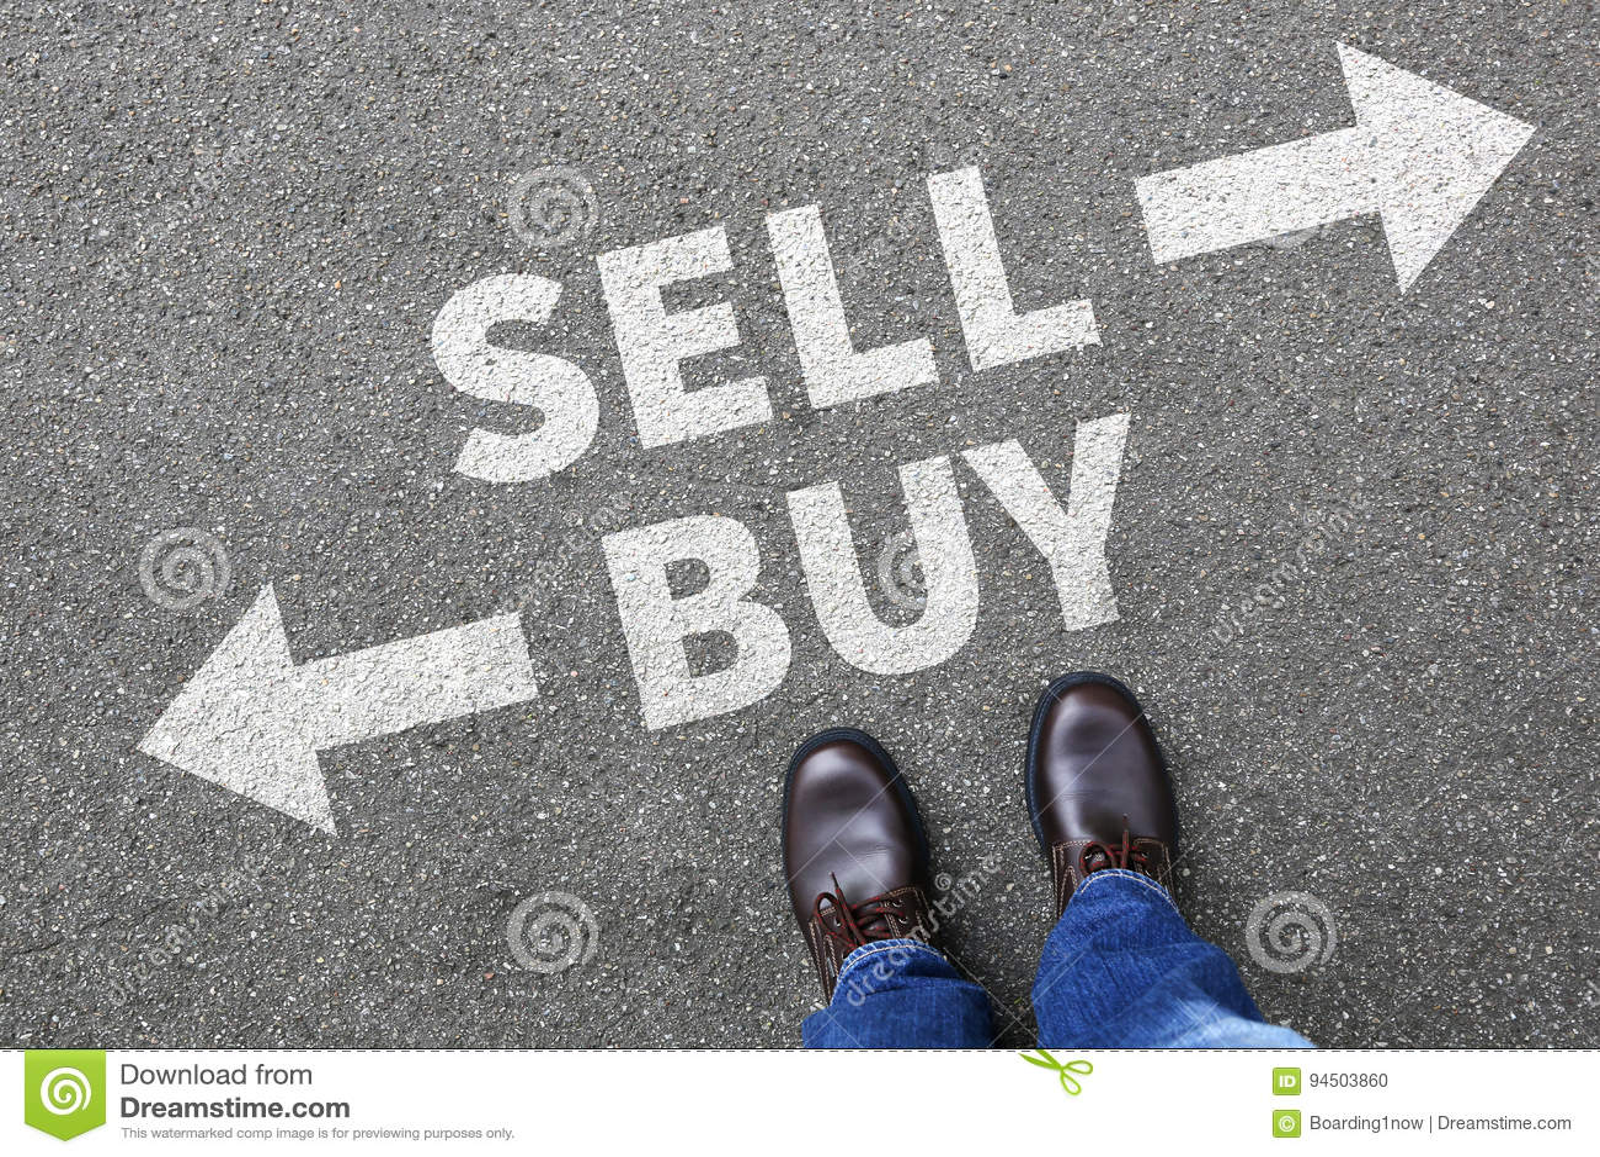 Sell buy selling buying goods trading stock exchange banking bus